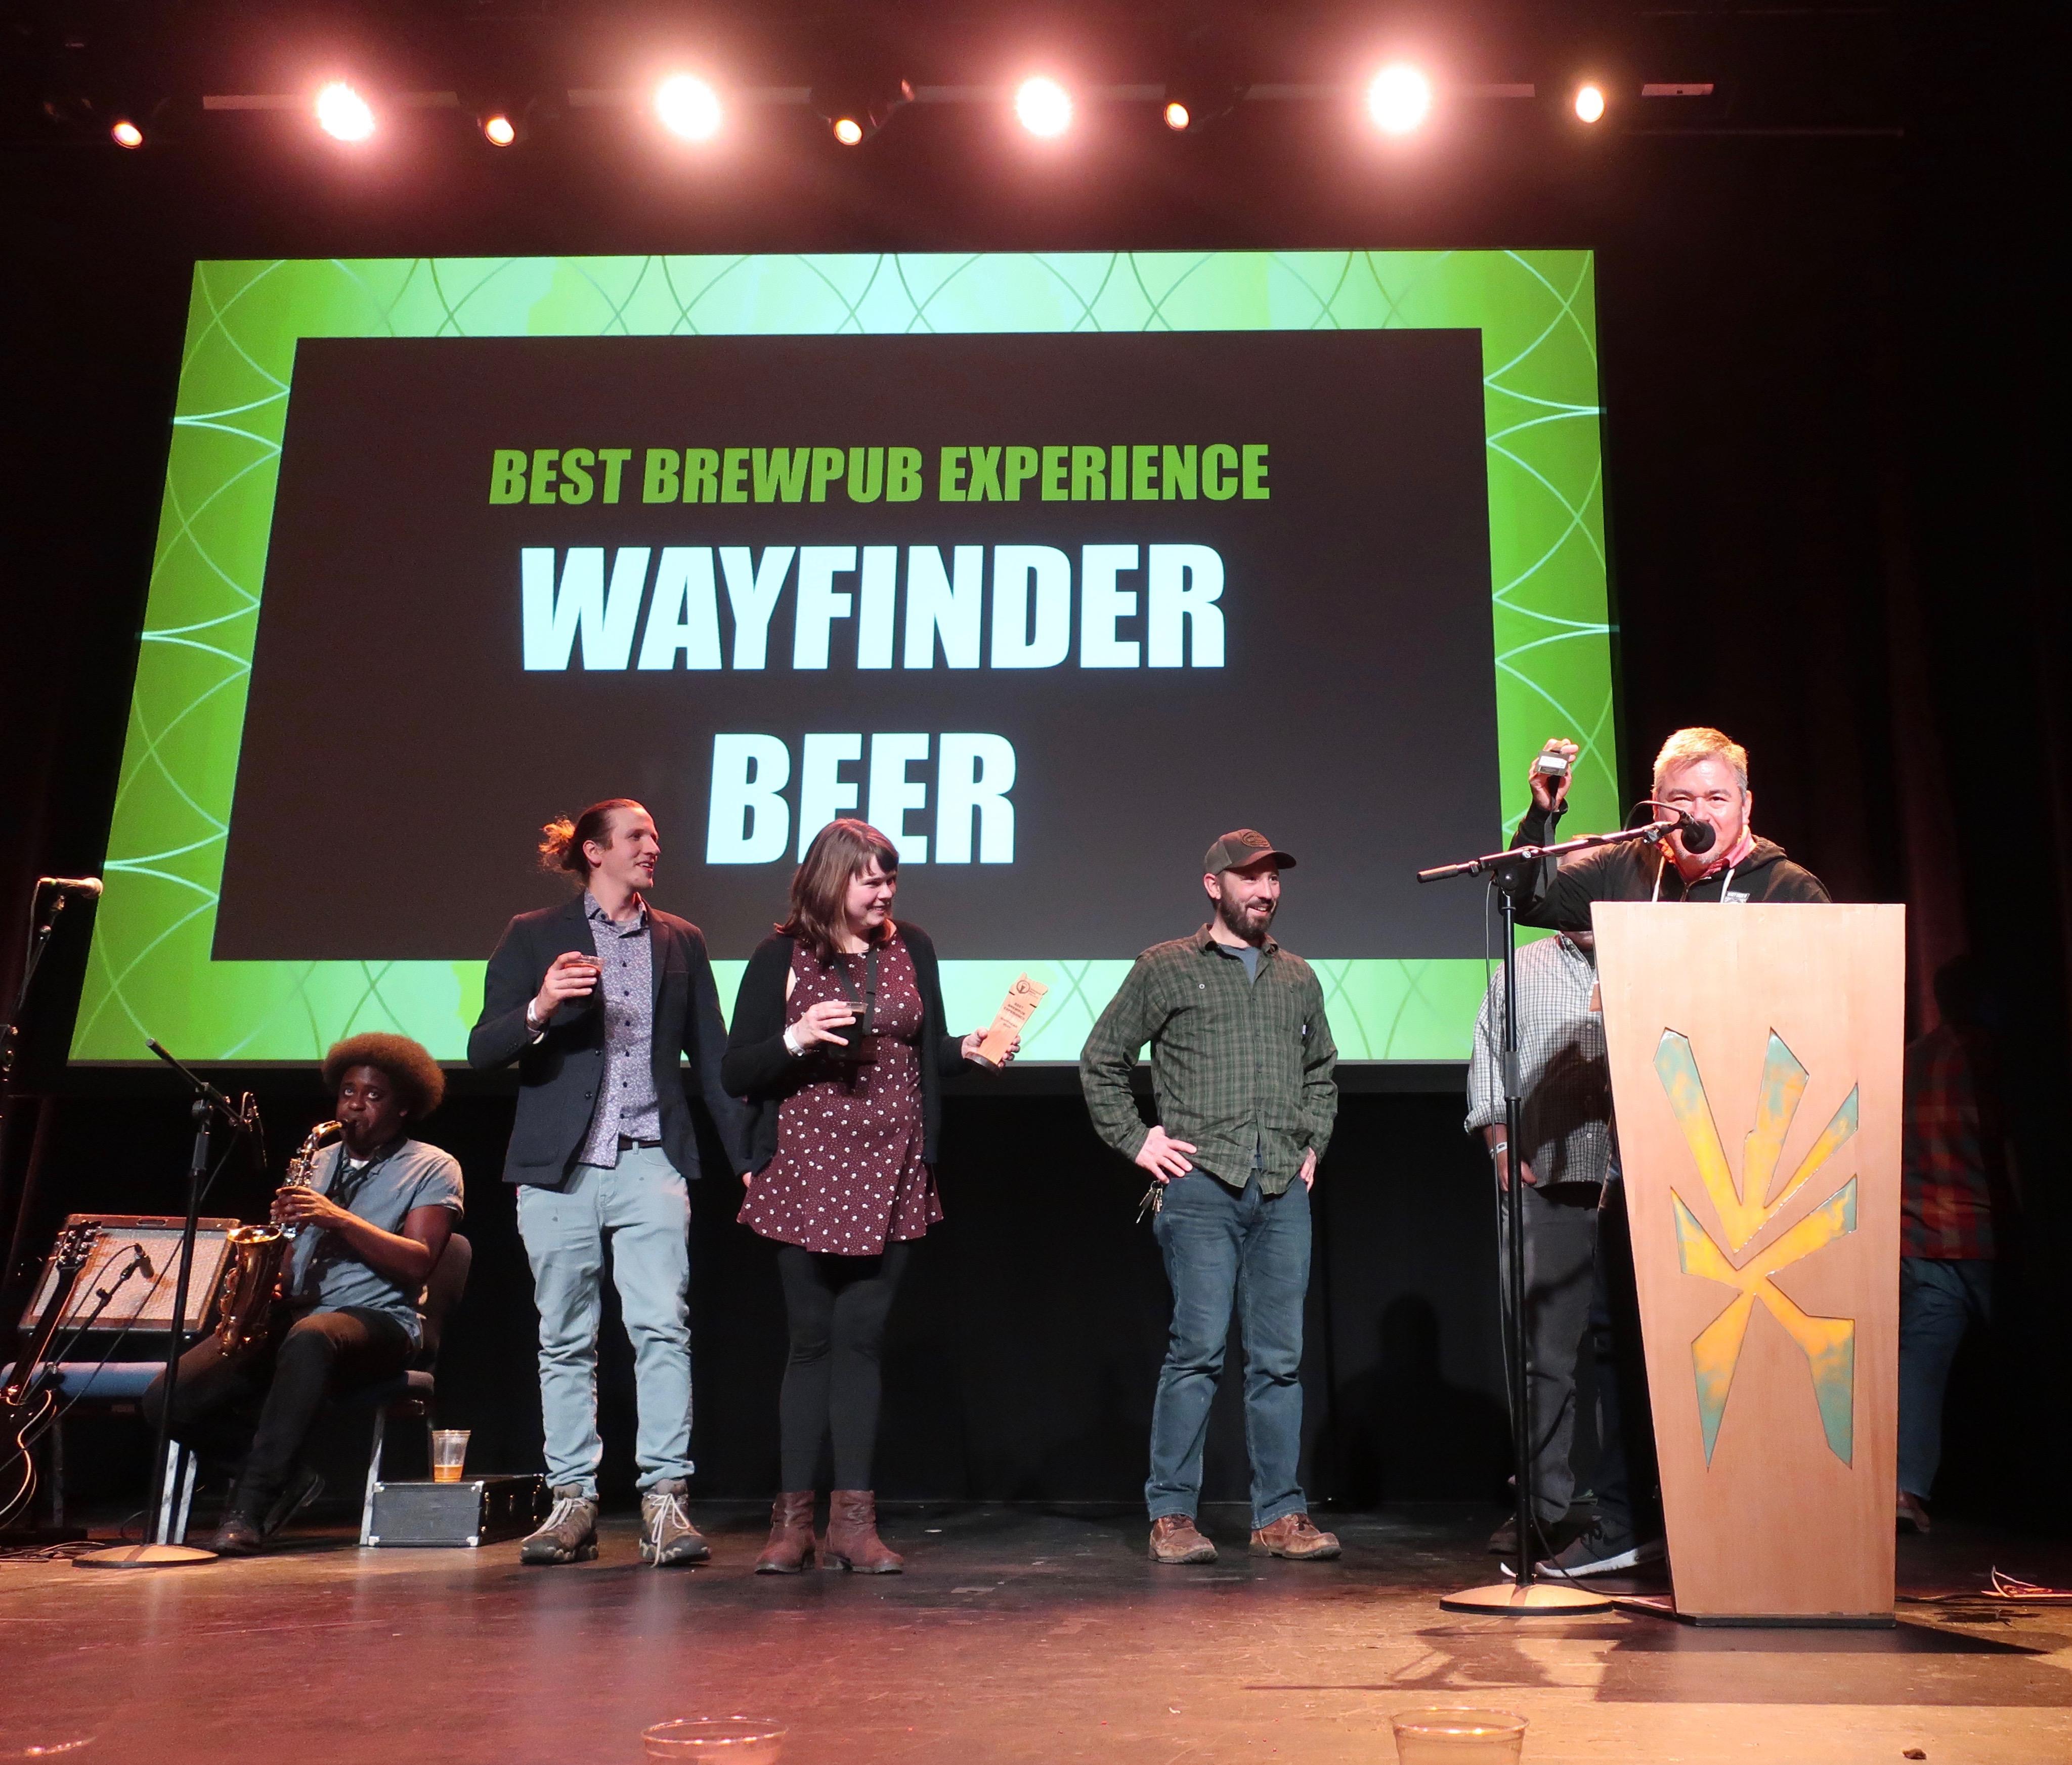 Wayfinder Beer wins Best Brewpub Experience at the 2019 Oregon Beer Awards.